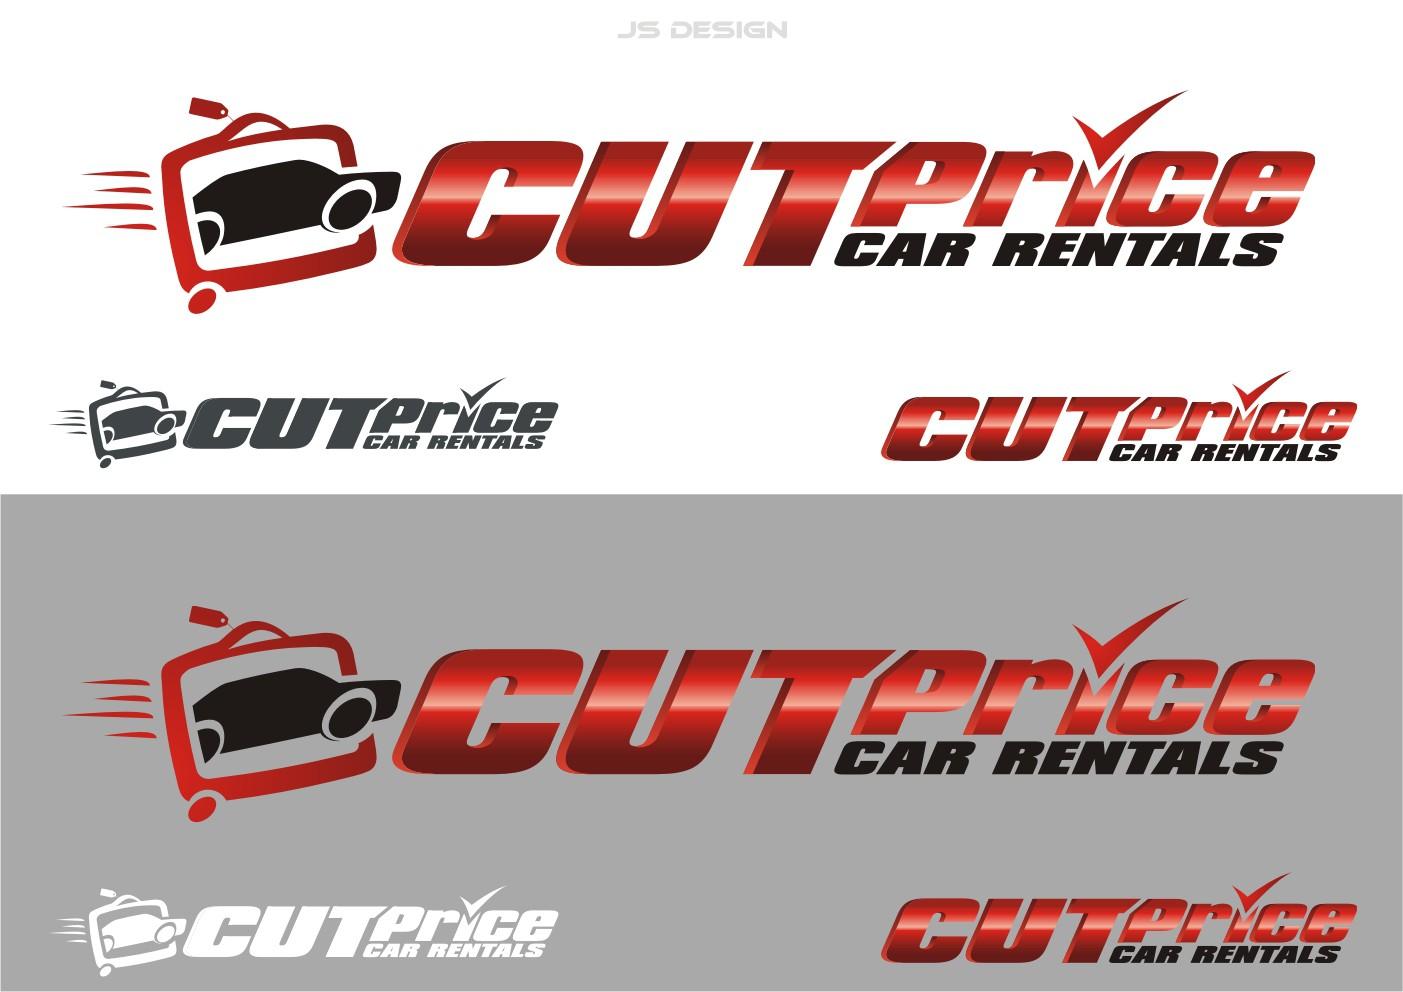 logo for Cut Price car rentals